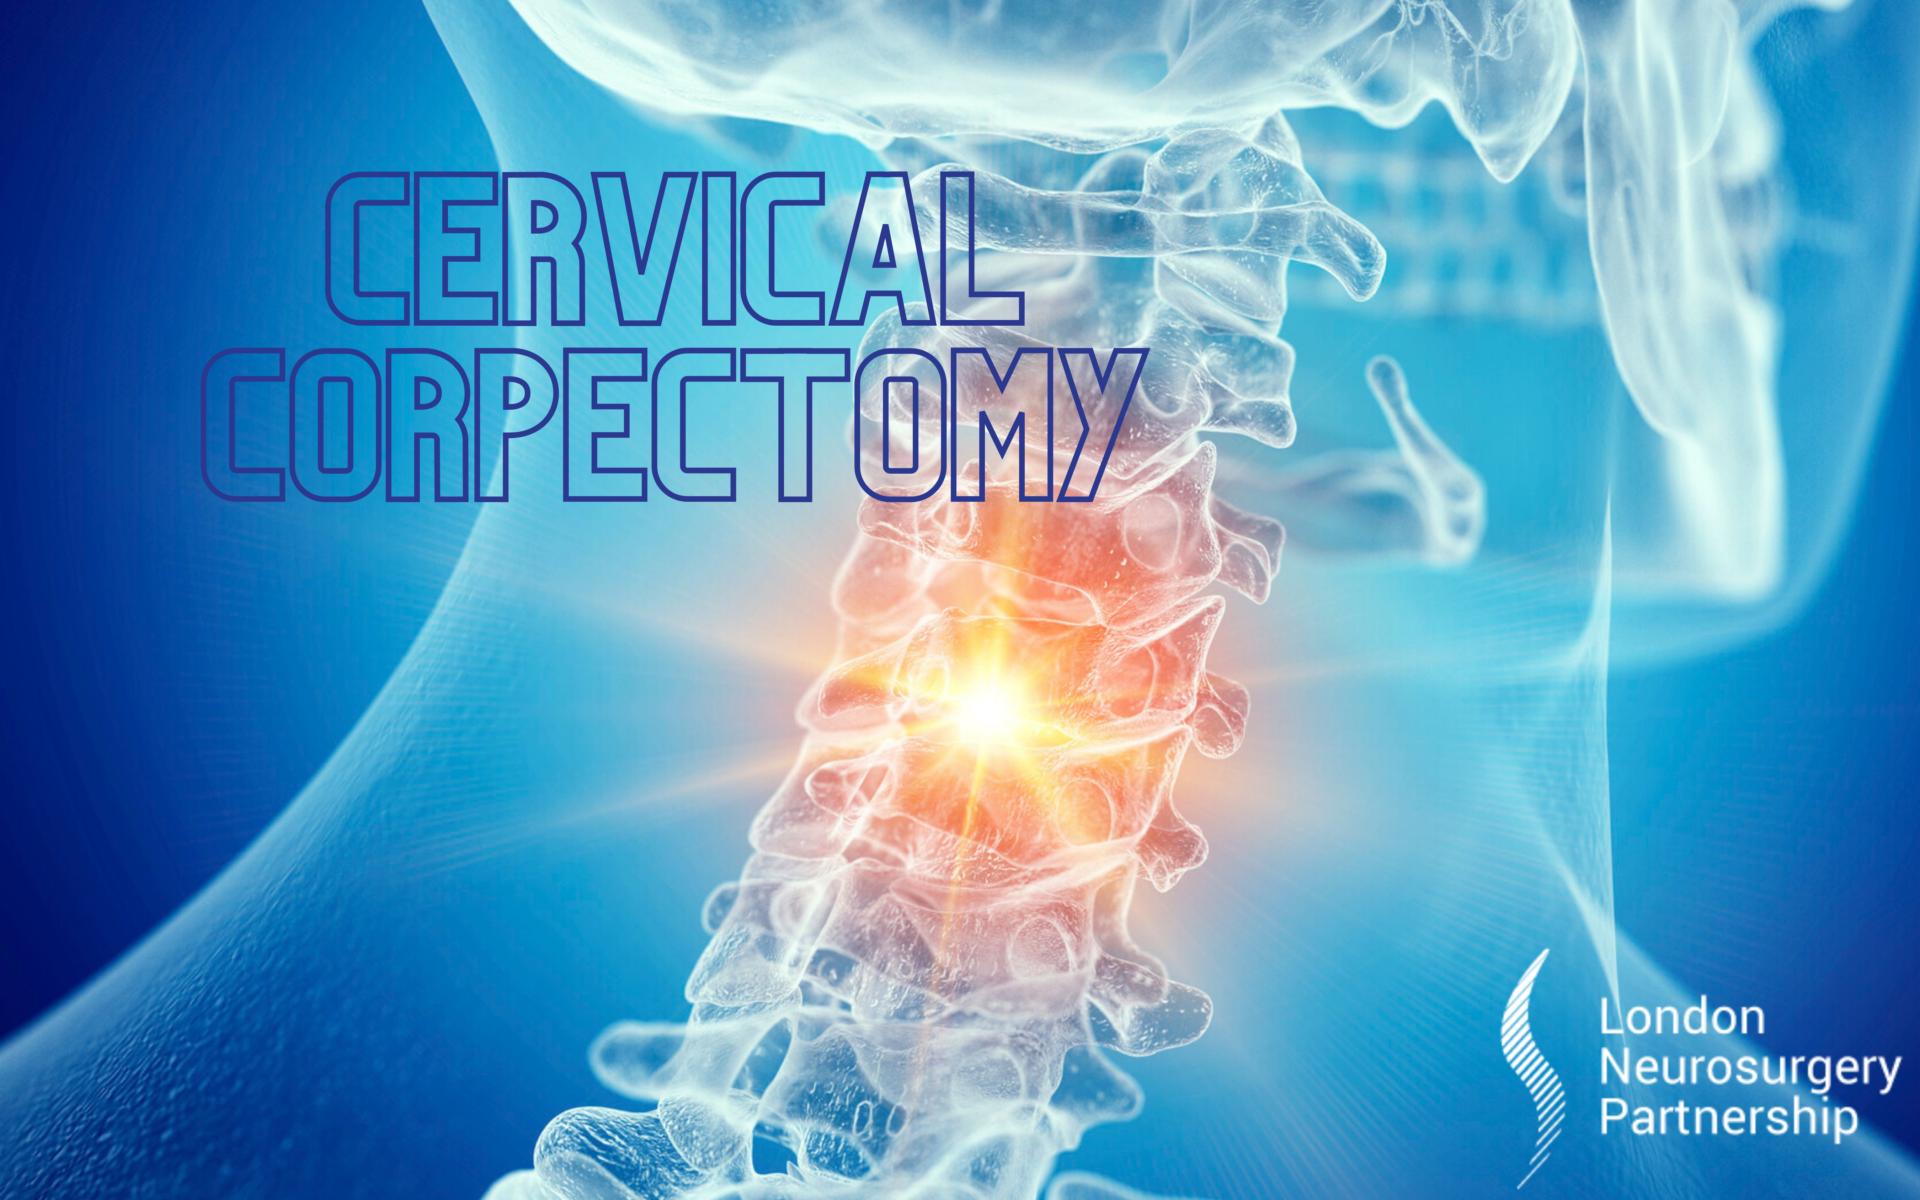 cervical corpectomy